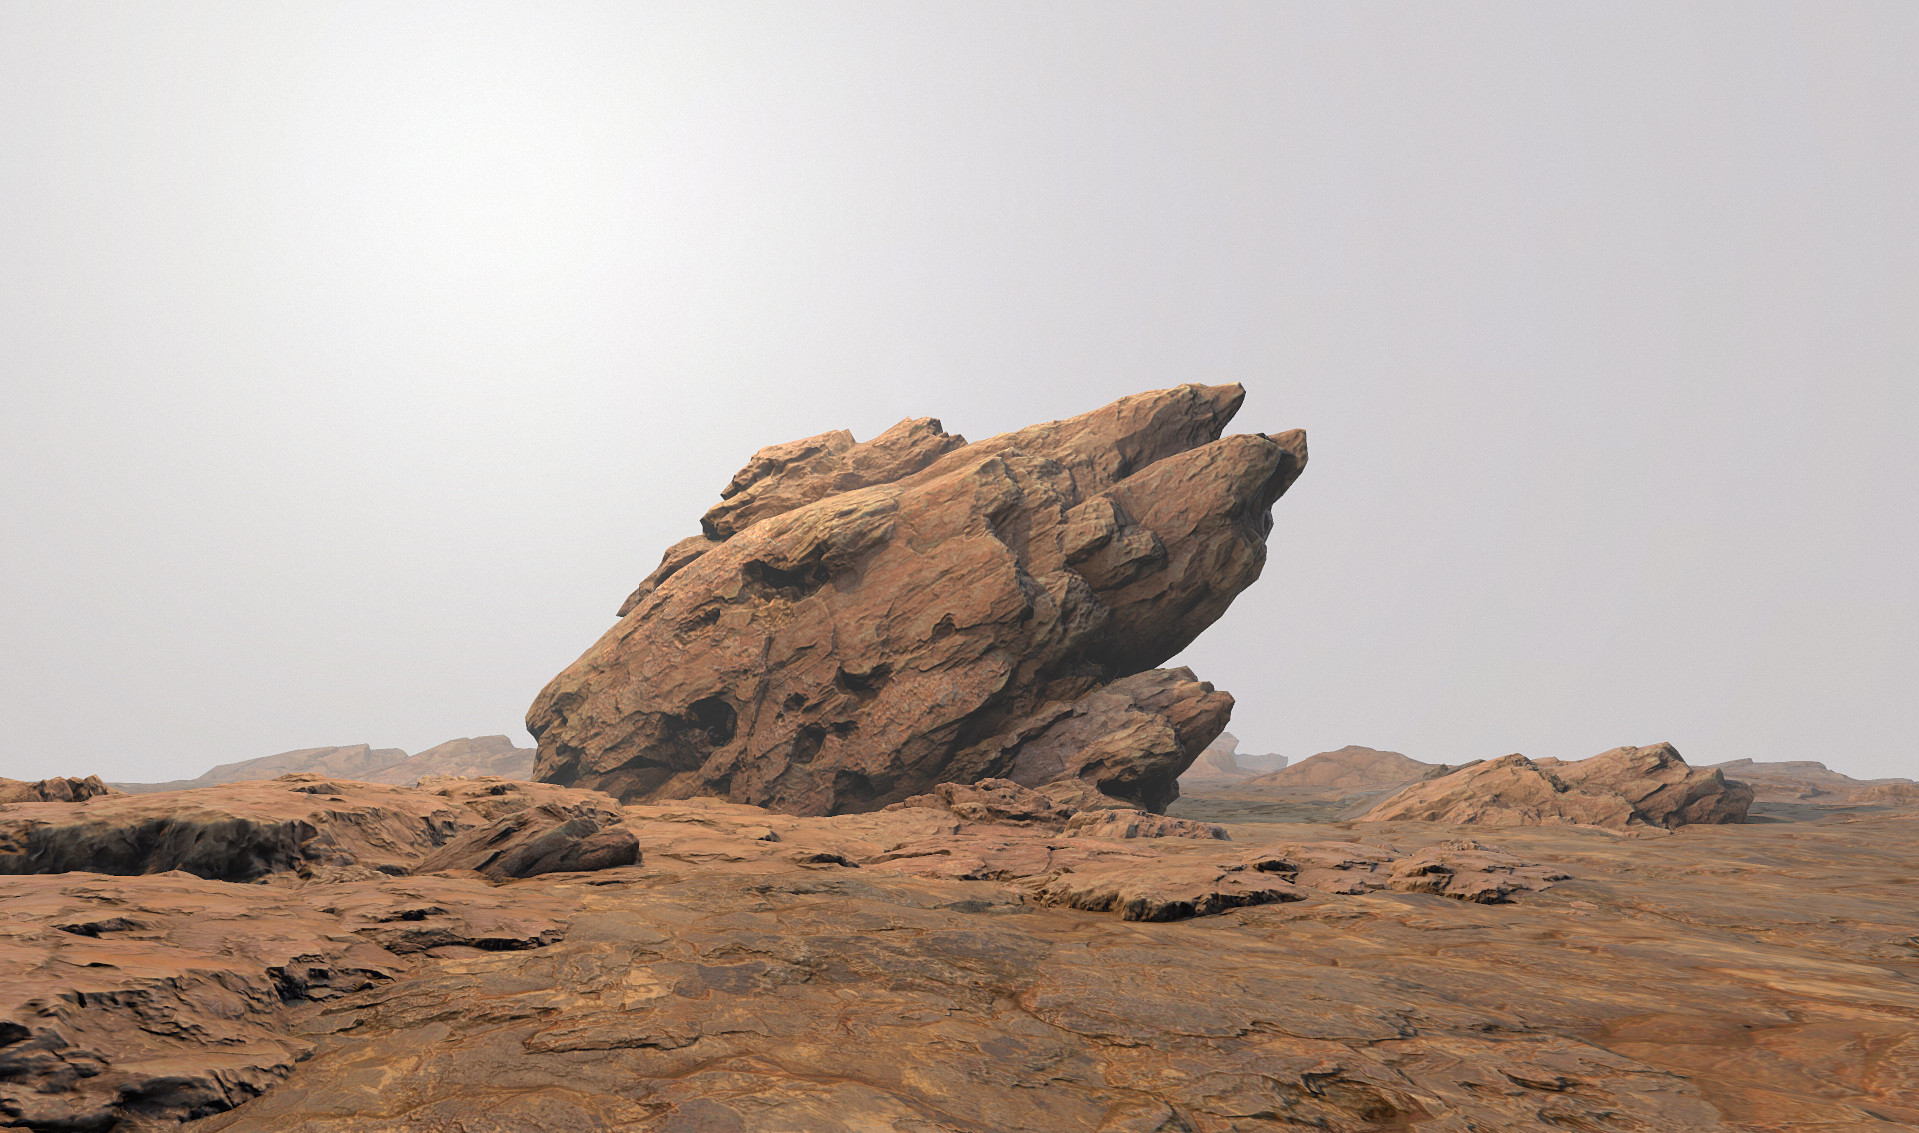 myeong-sup-kim-desert-rock-marmoset-02.j